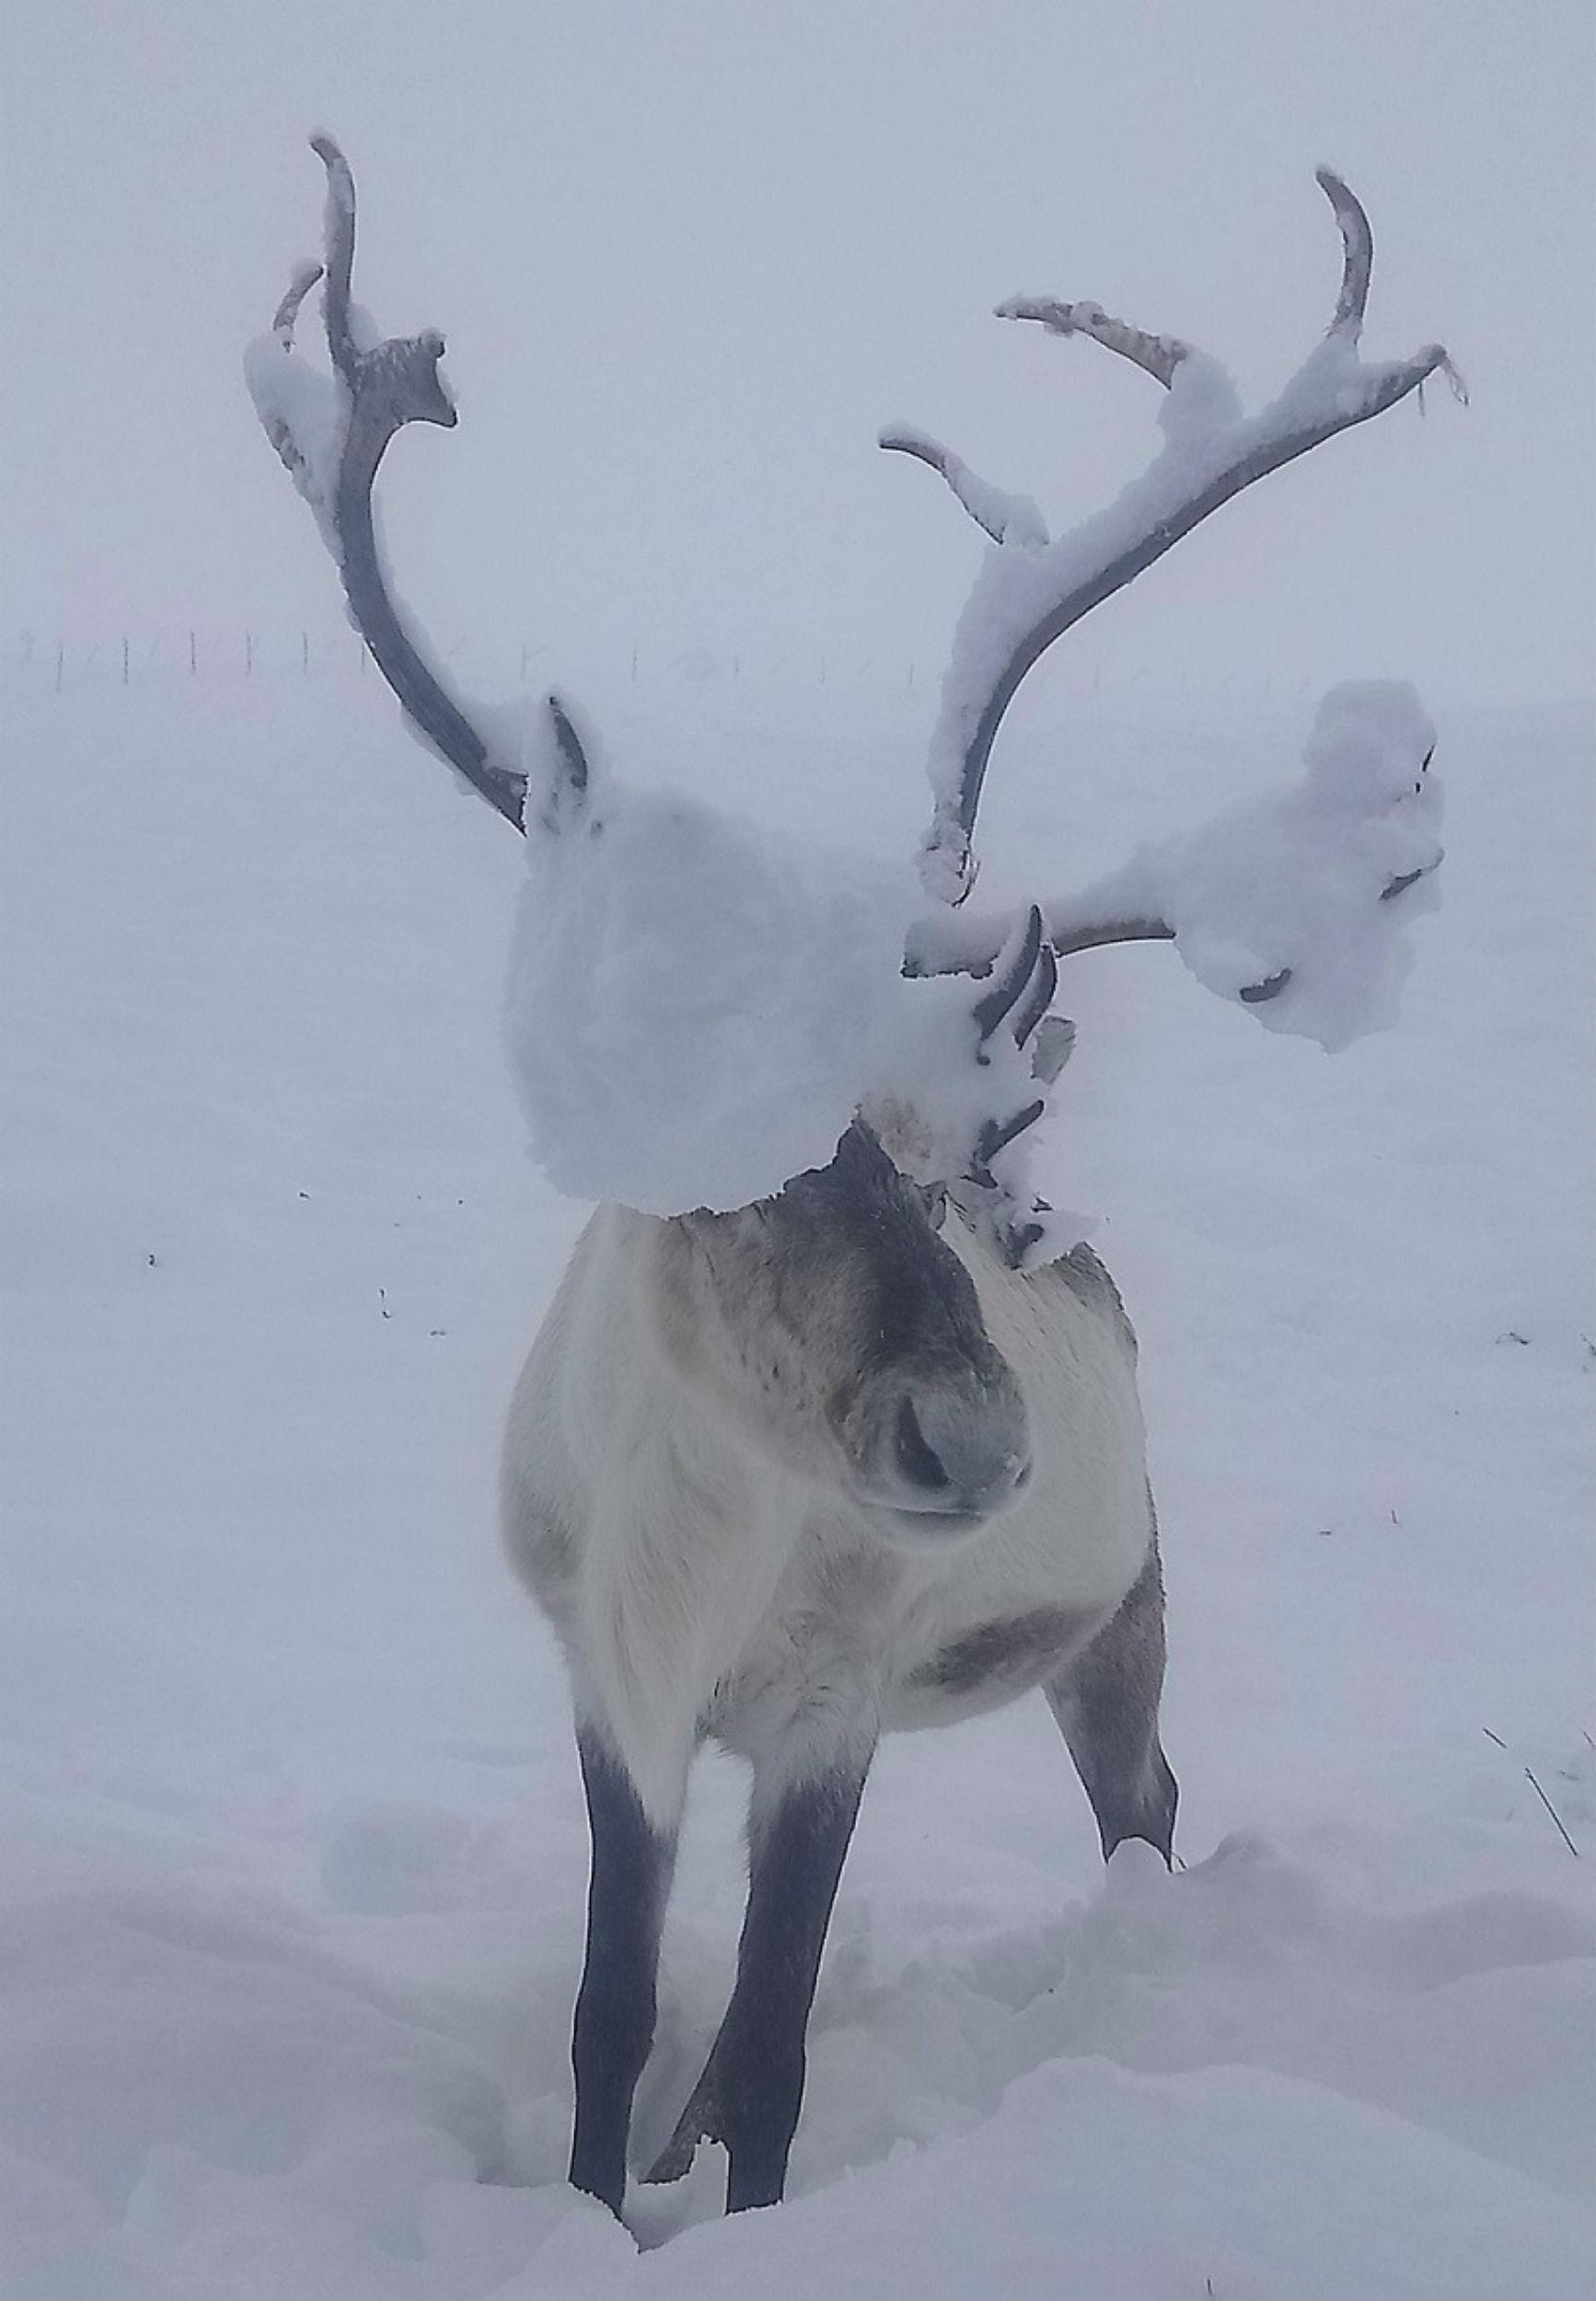 Reindeer with snow on - Scottish News